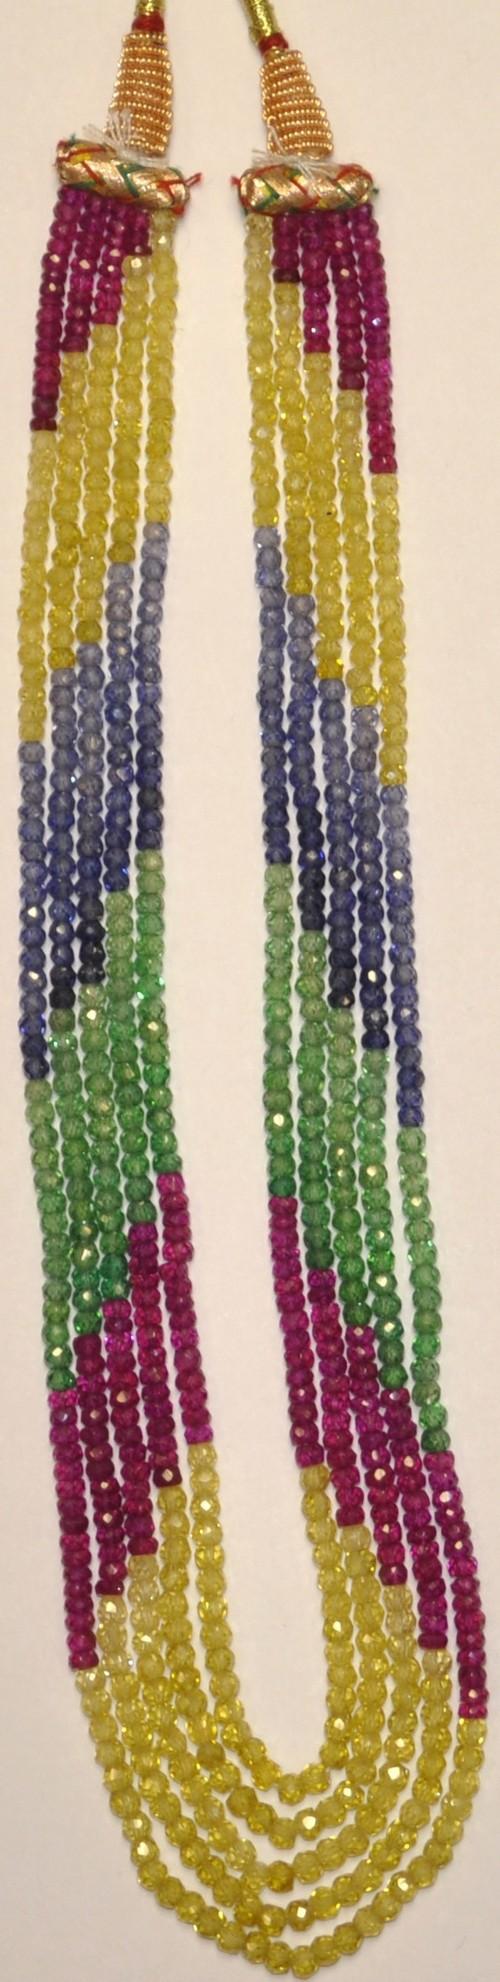 Multi Color Cubic Zircon Beads